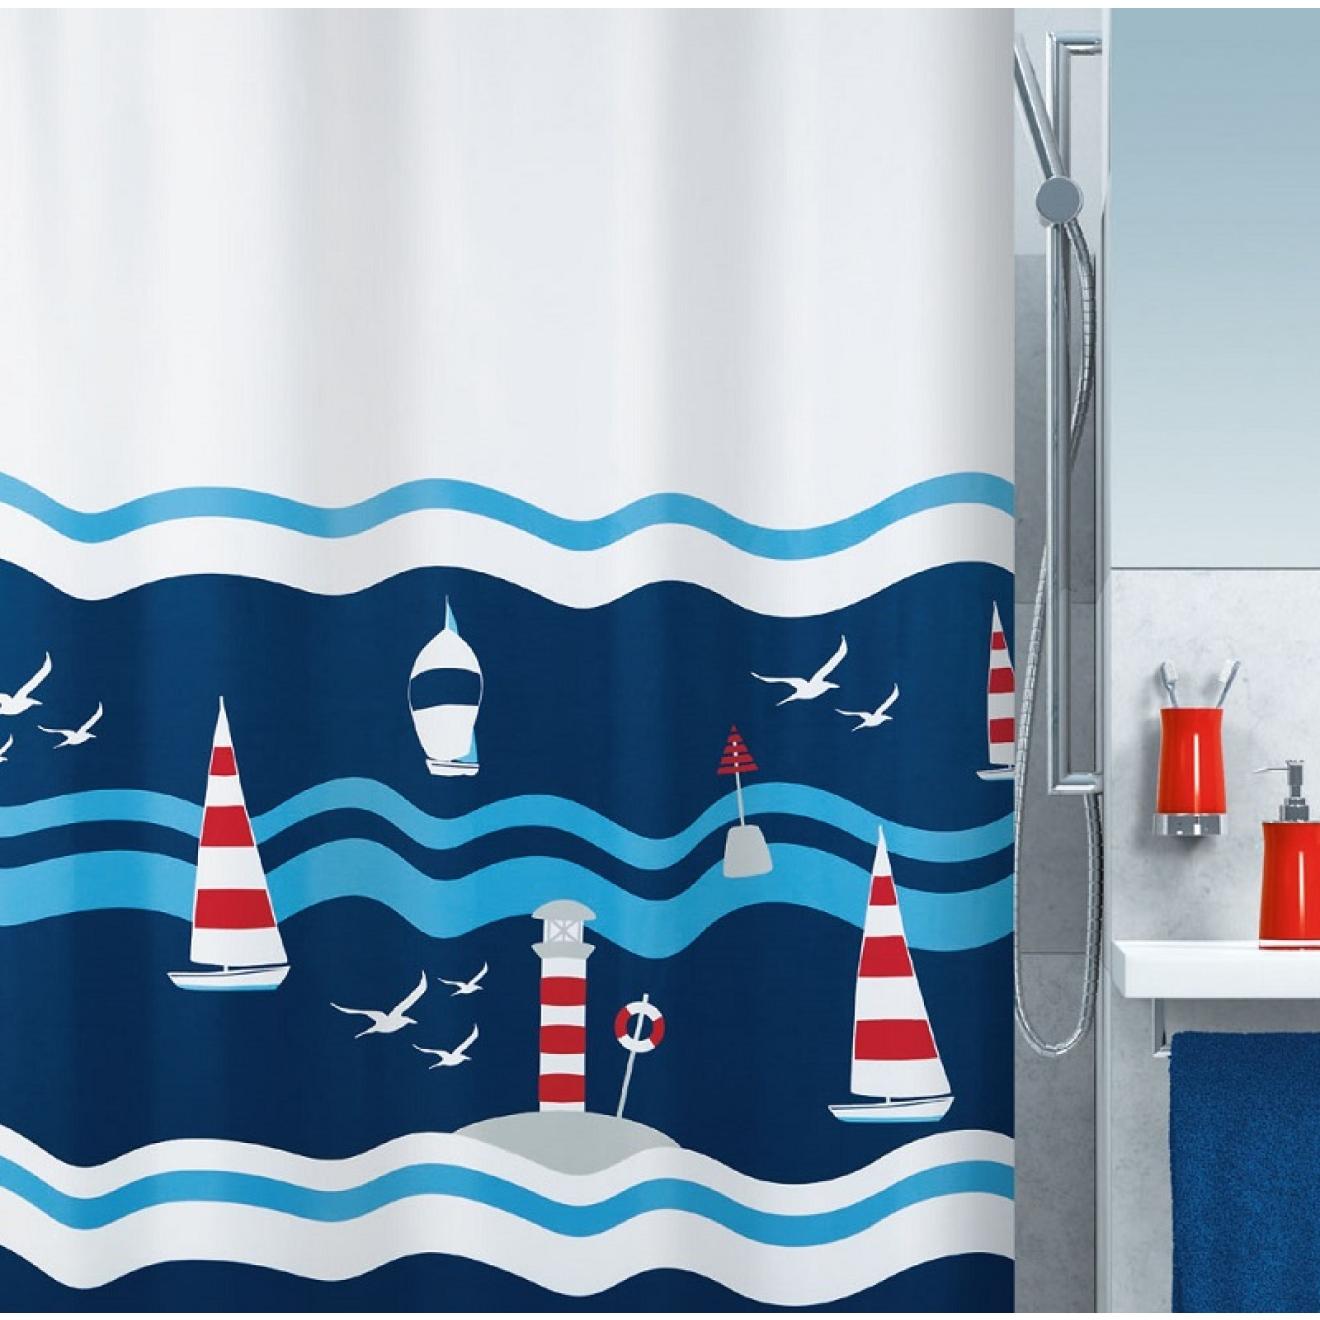 duschvorhang clipperi textil 180 x 200cm. Black Bedroom Furniture Sets. Home Design Ideas